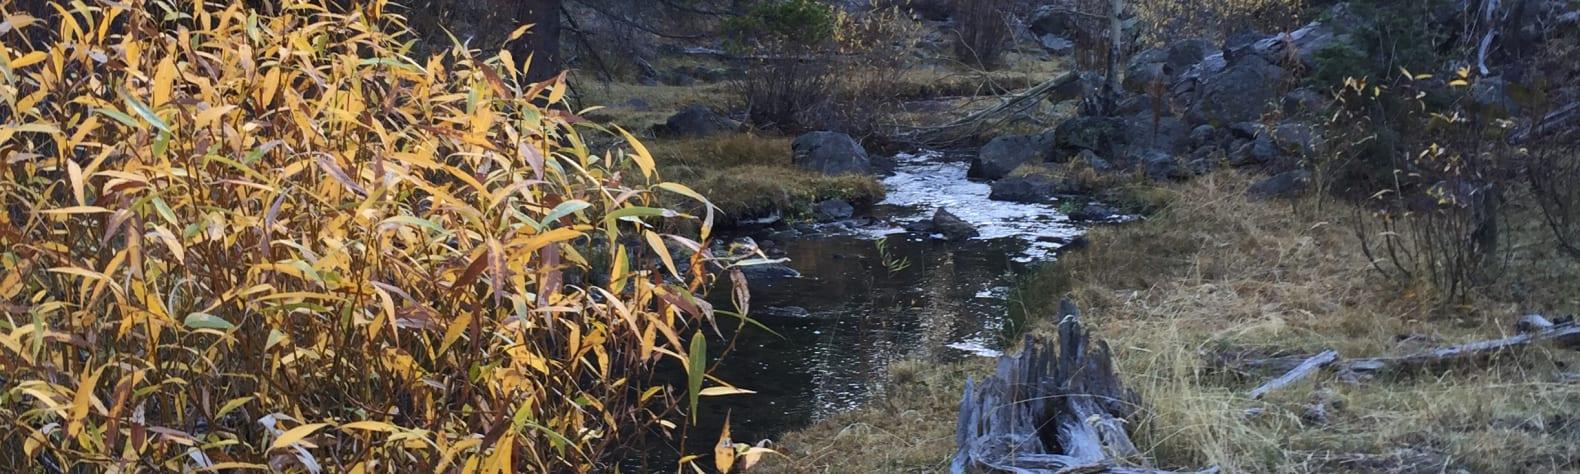 Fremont-Winema National Forest